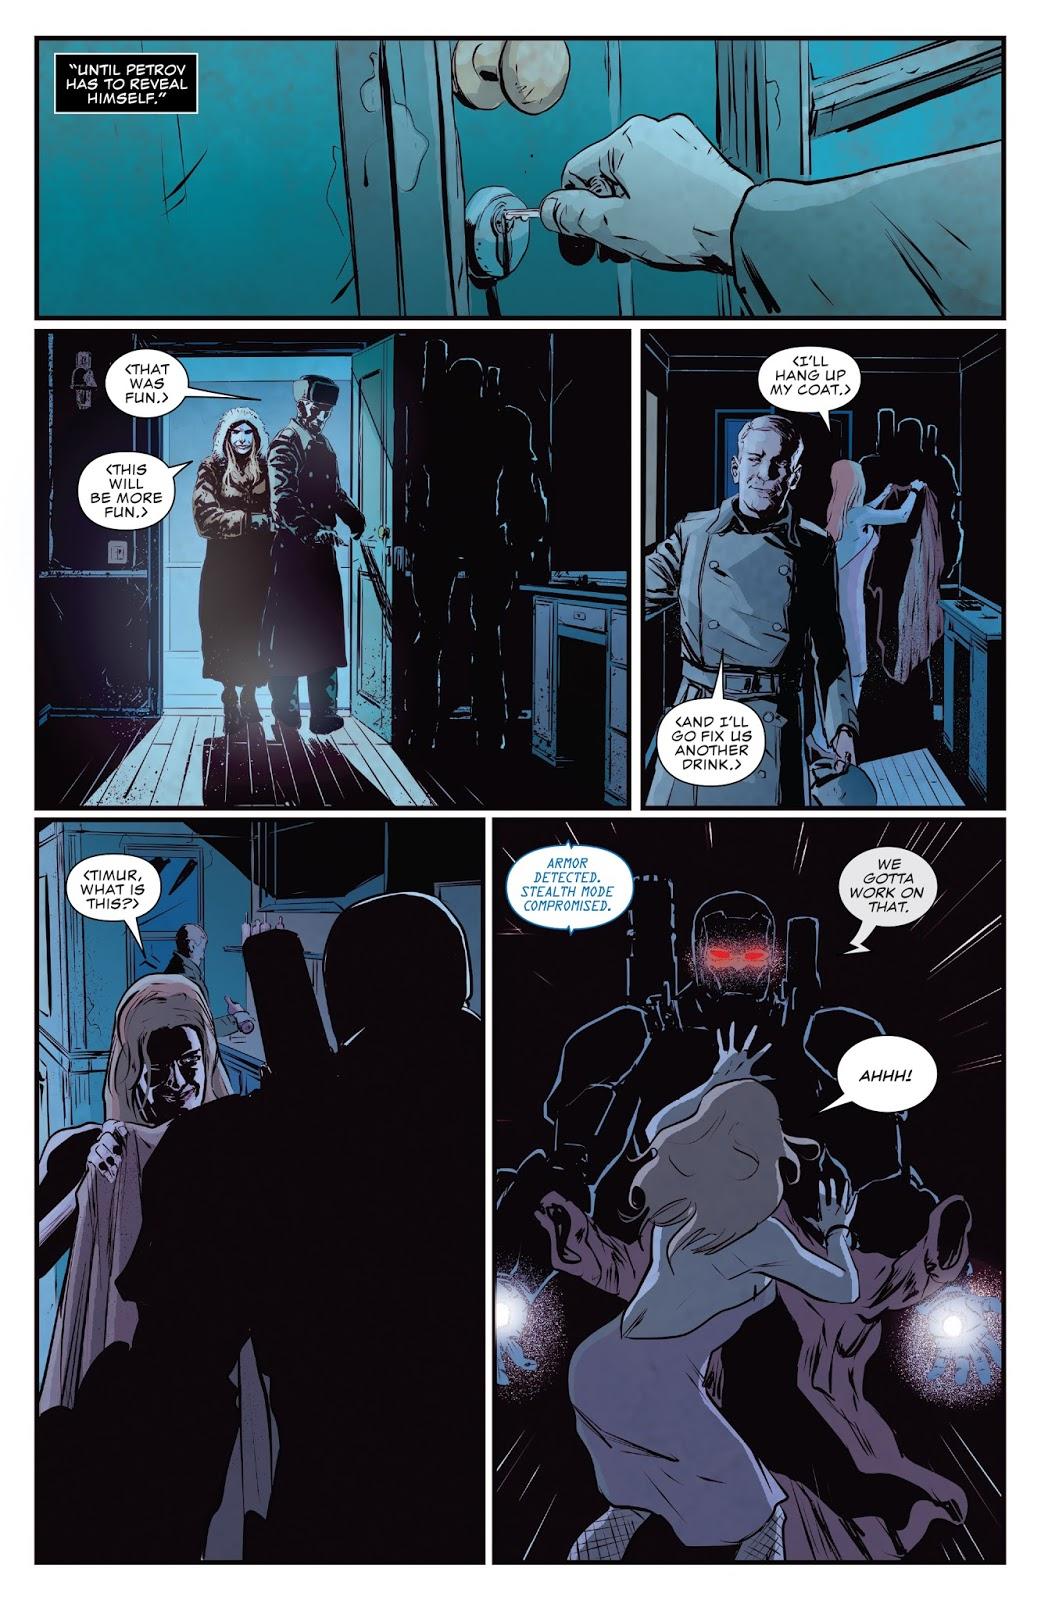 The Punisher Kills Petrov's Inner Circle